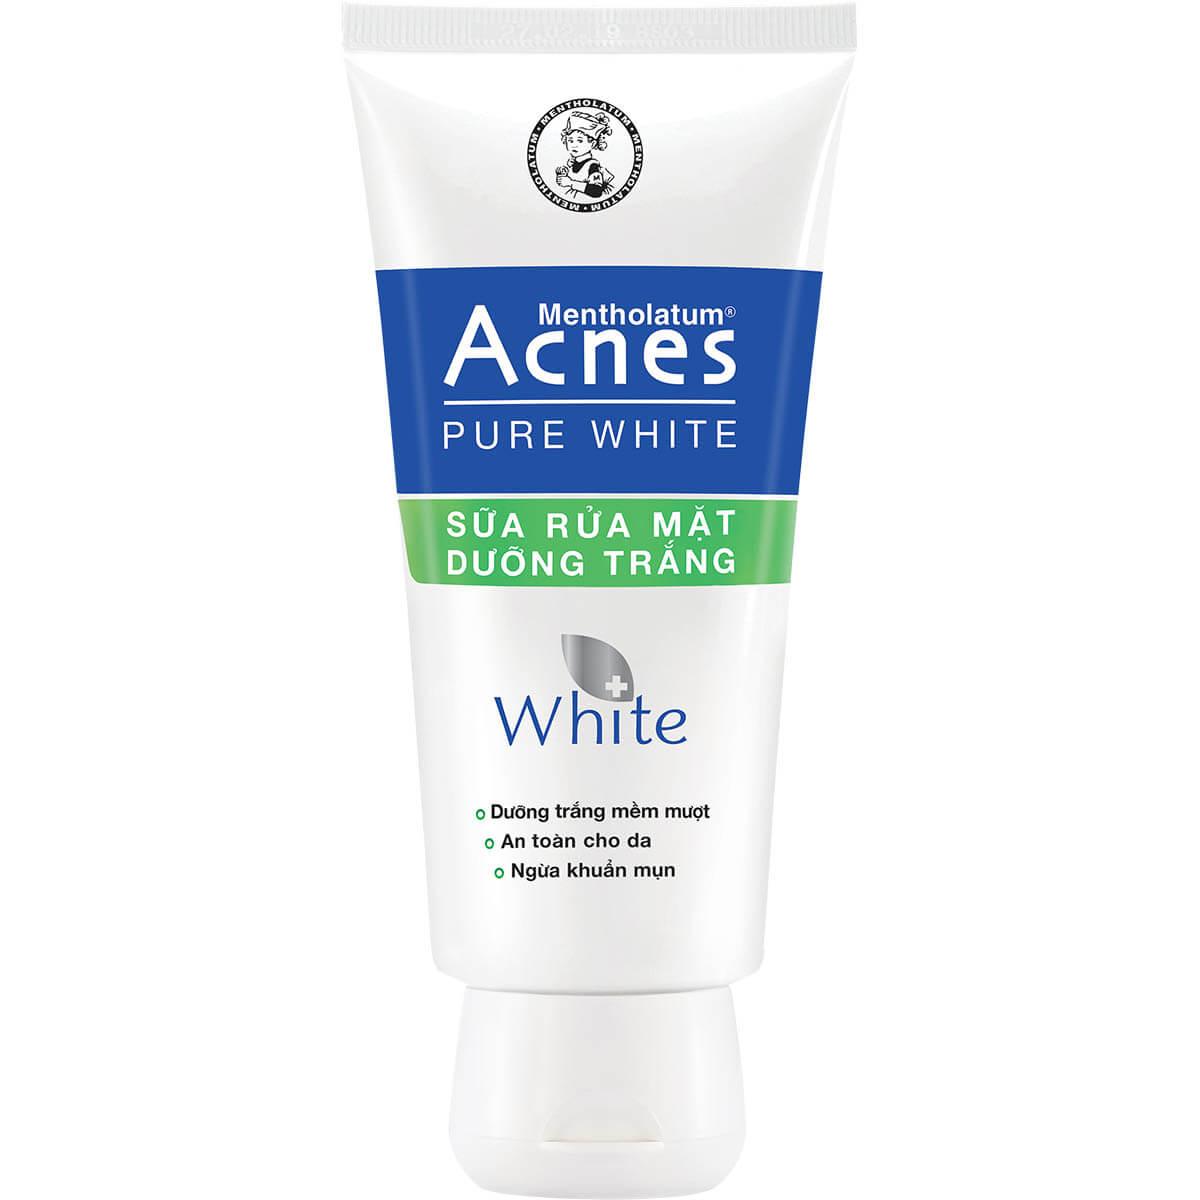 Acnes Pure White Cleanser - Sữa rửa mặt dưỡng trắng da, ngăn ngừa mụn